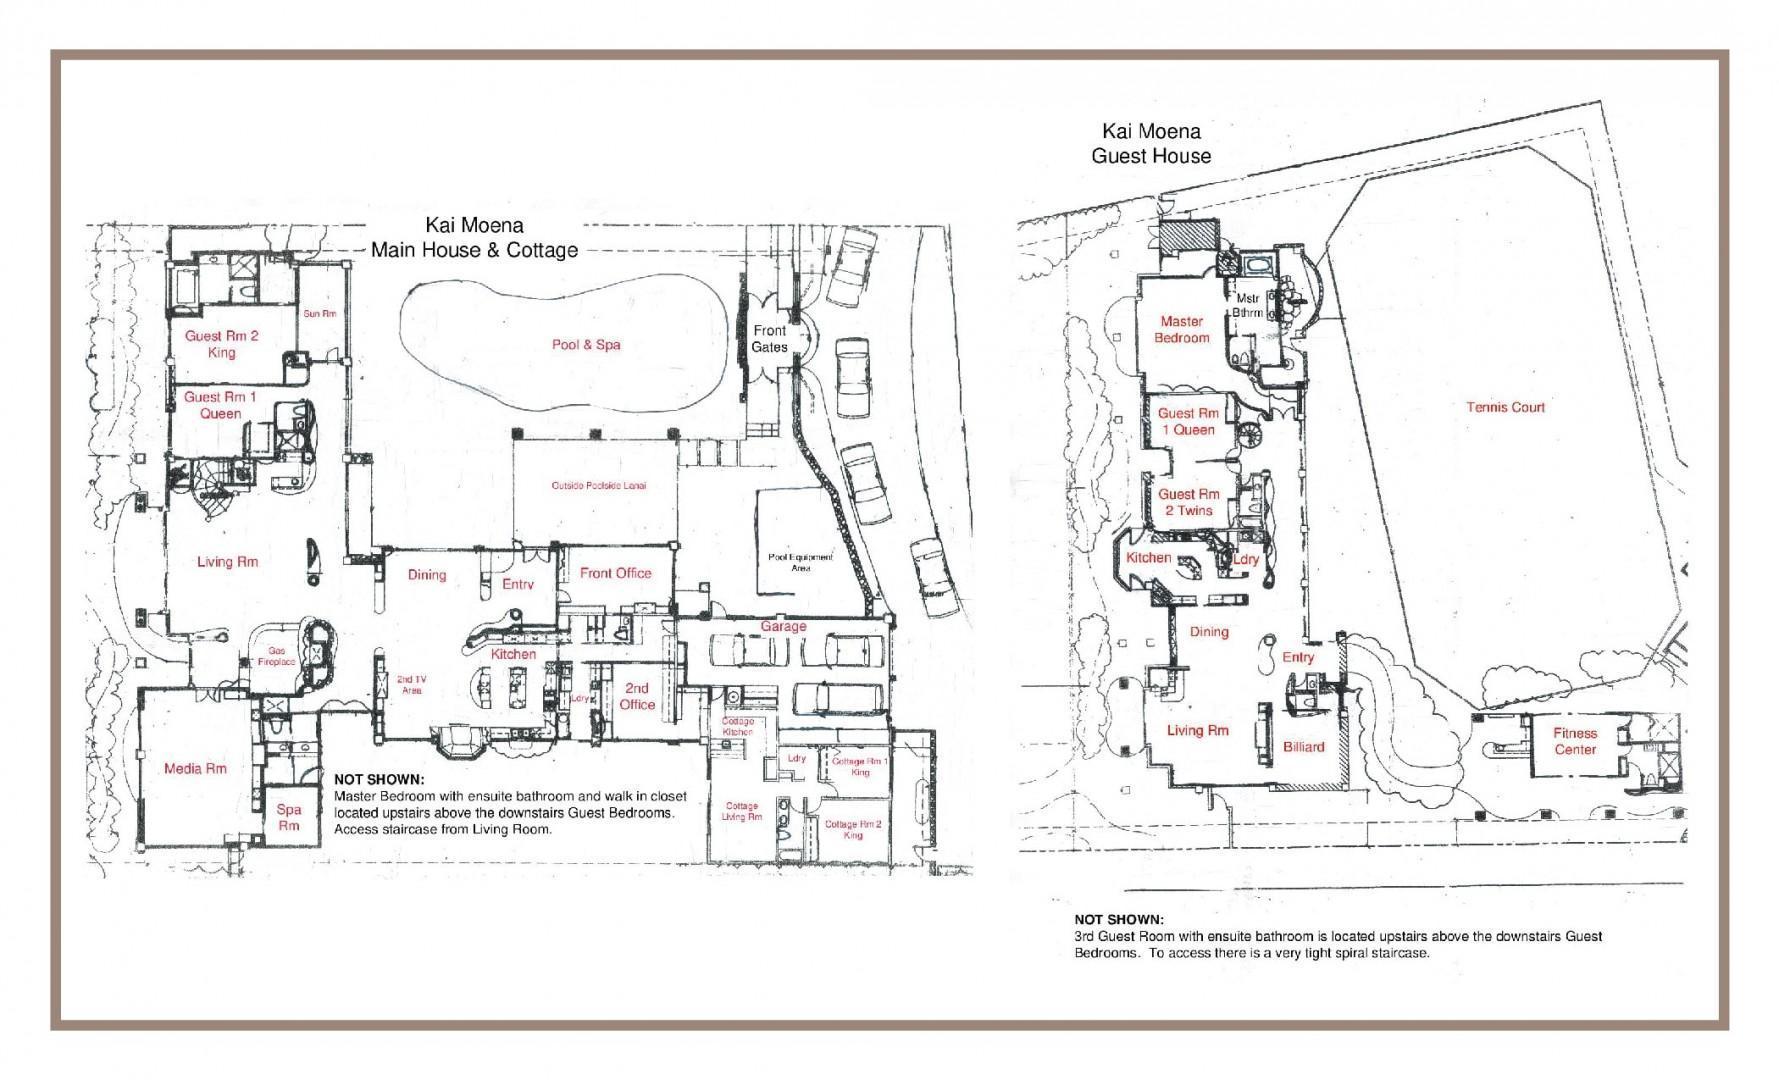 Kai Moena Estate Floor Plan